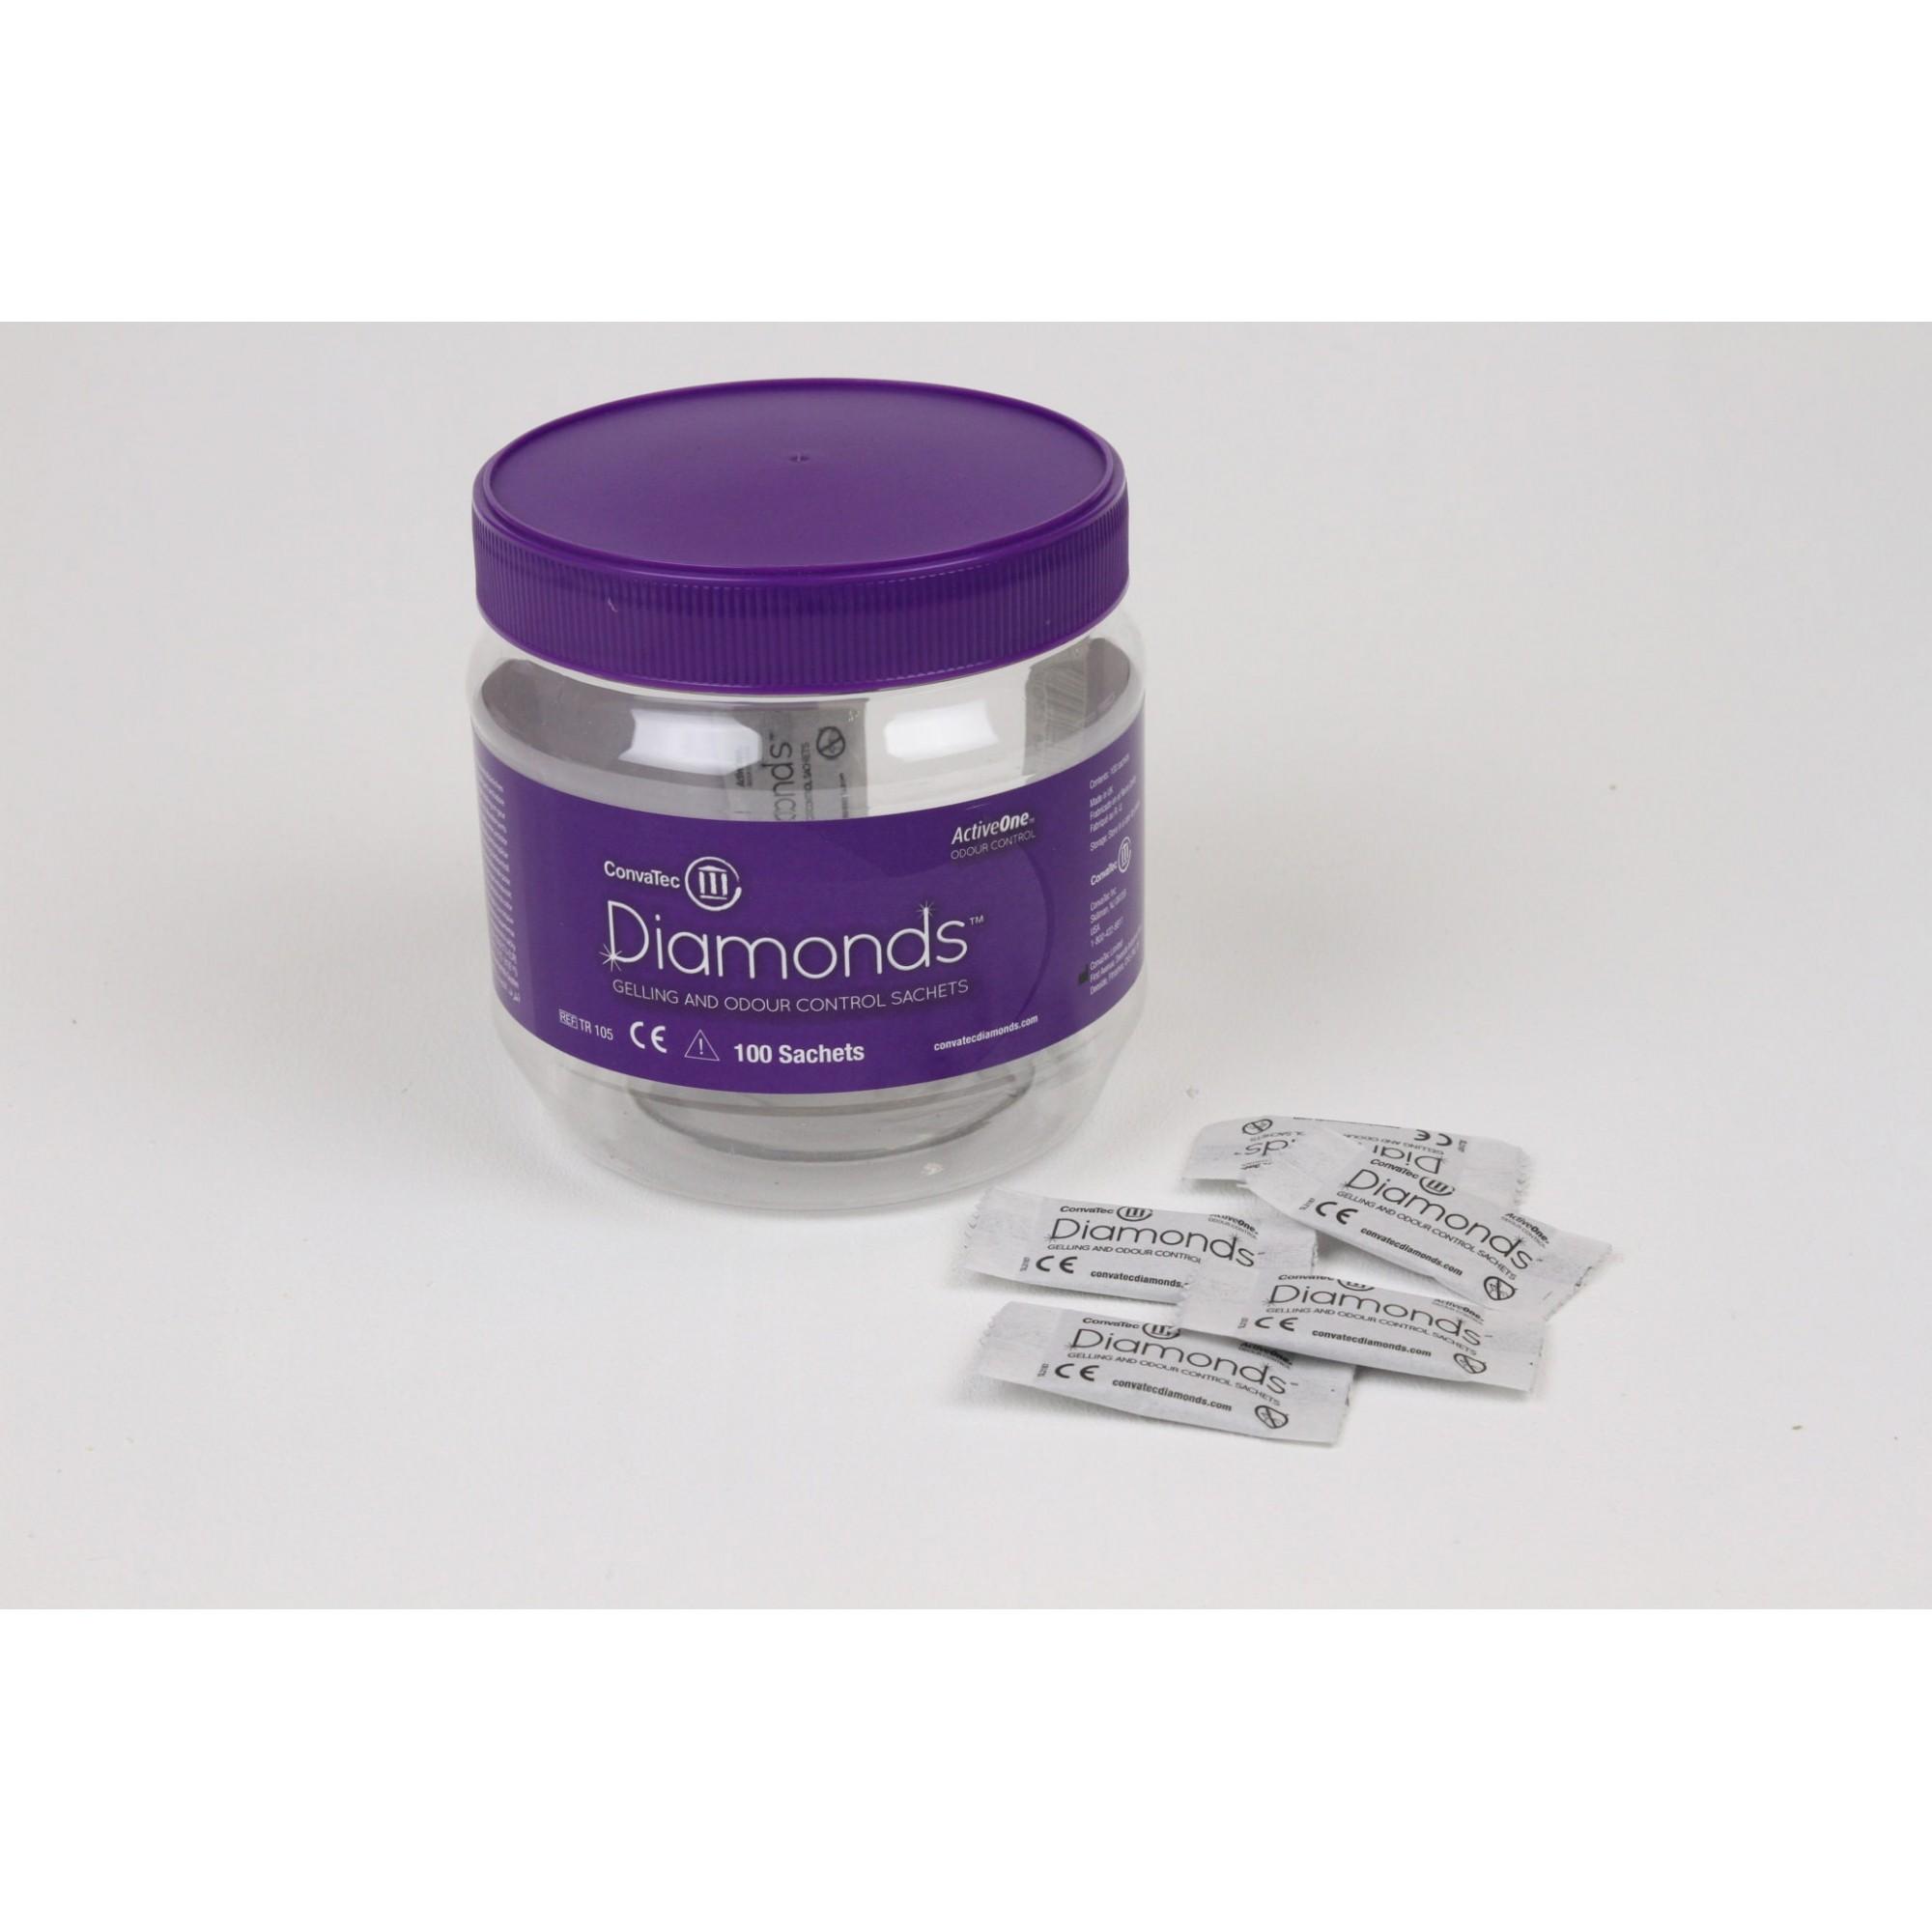 DIAMONDS GEL CONTRA ODOR 10SCH 420791/BR10273 - (Convatec)